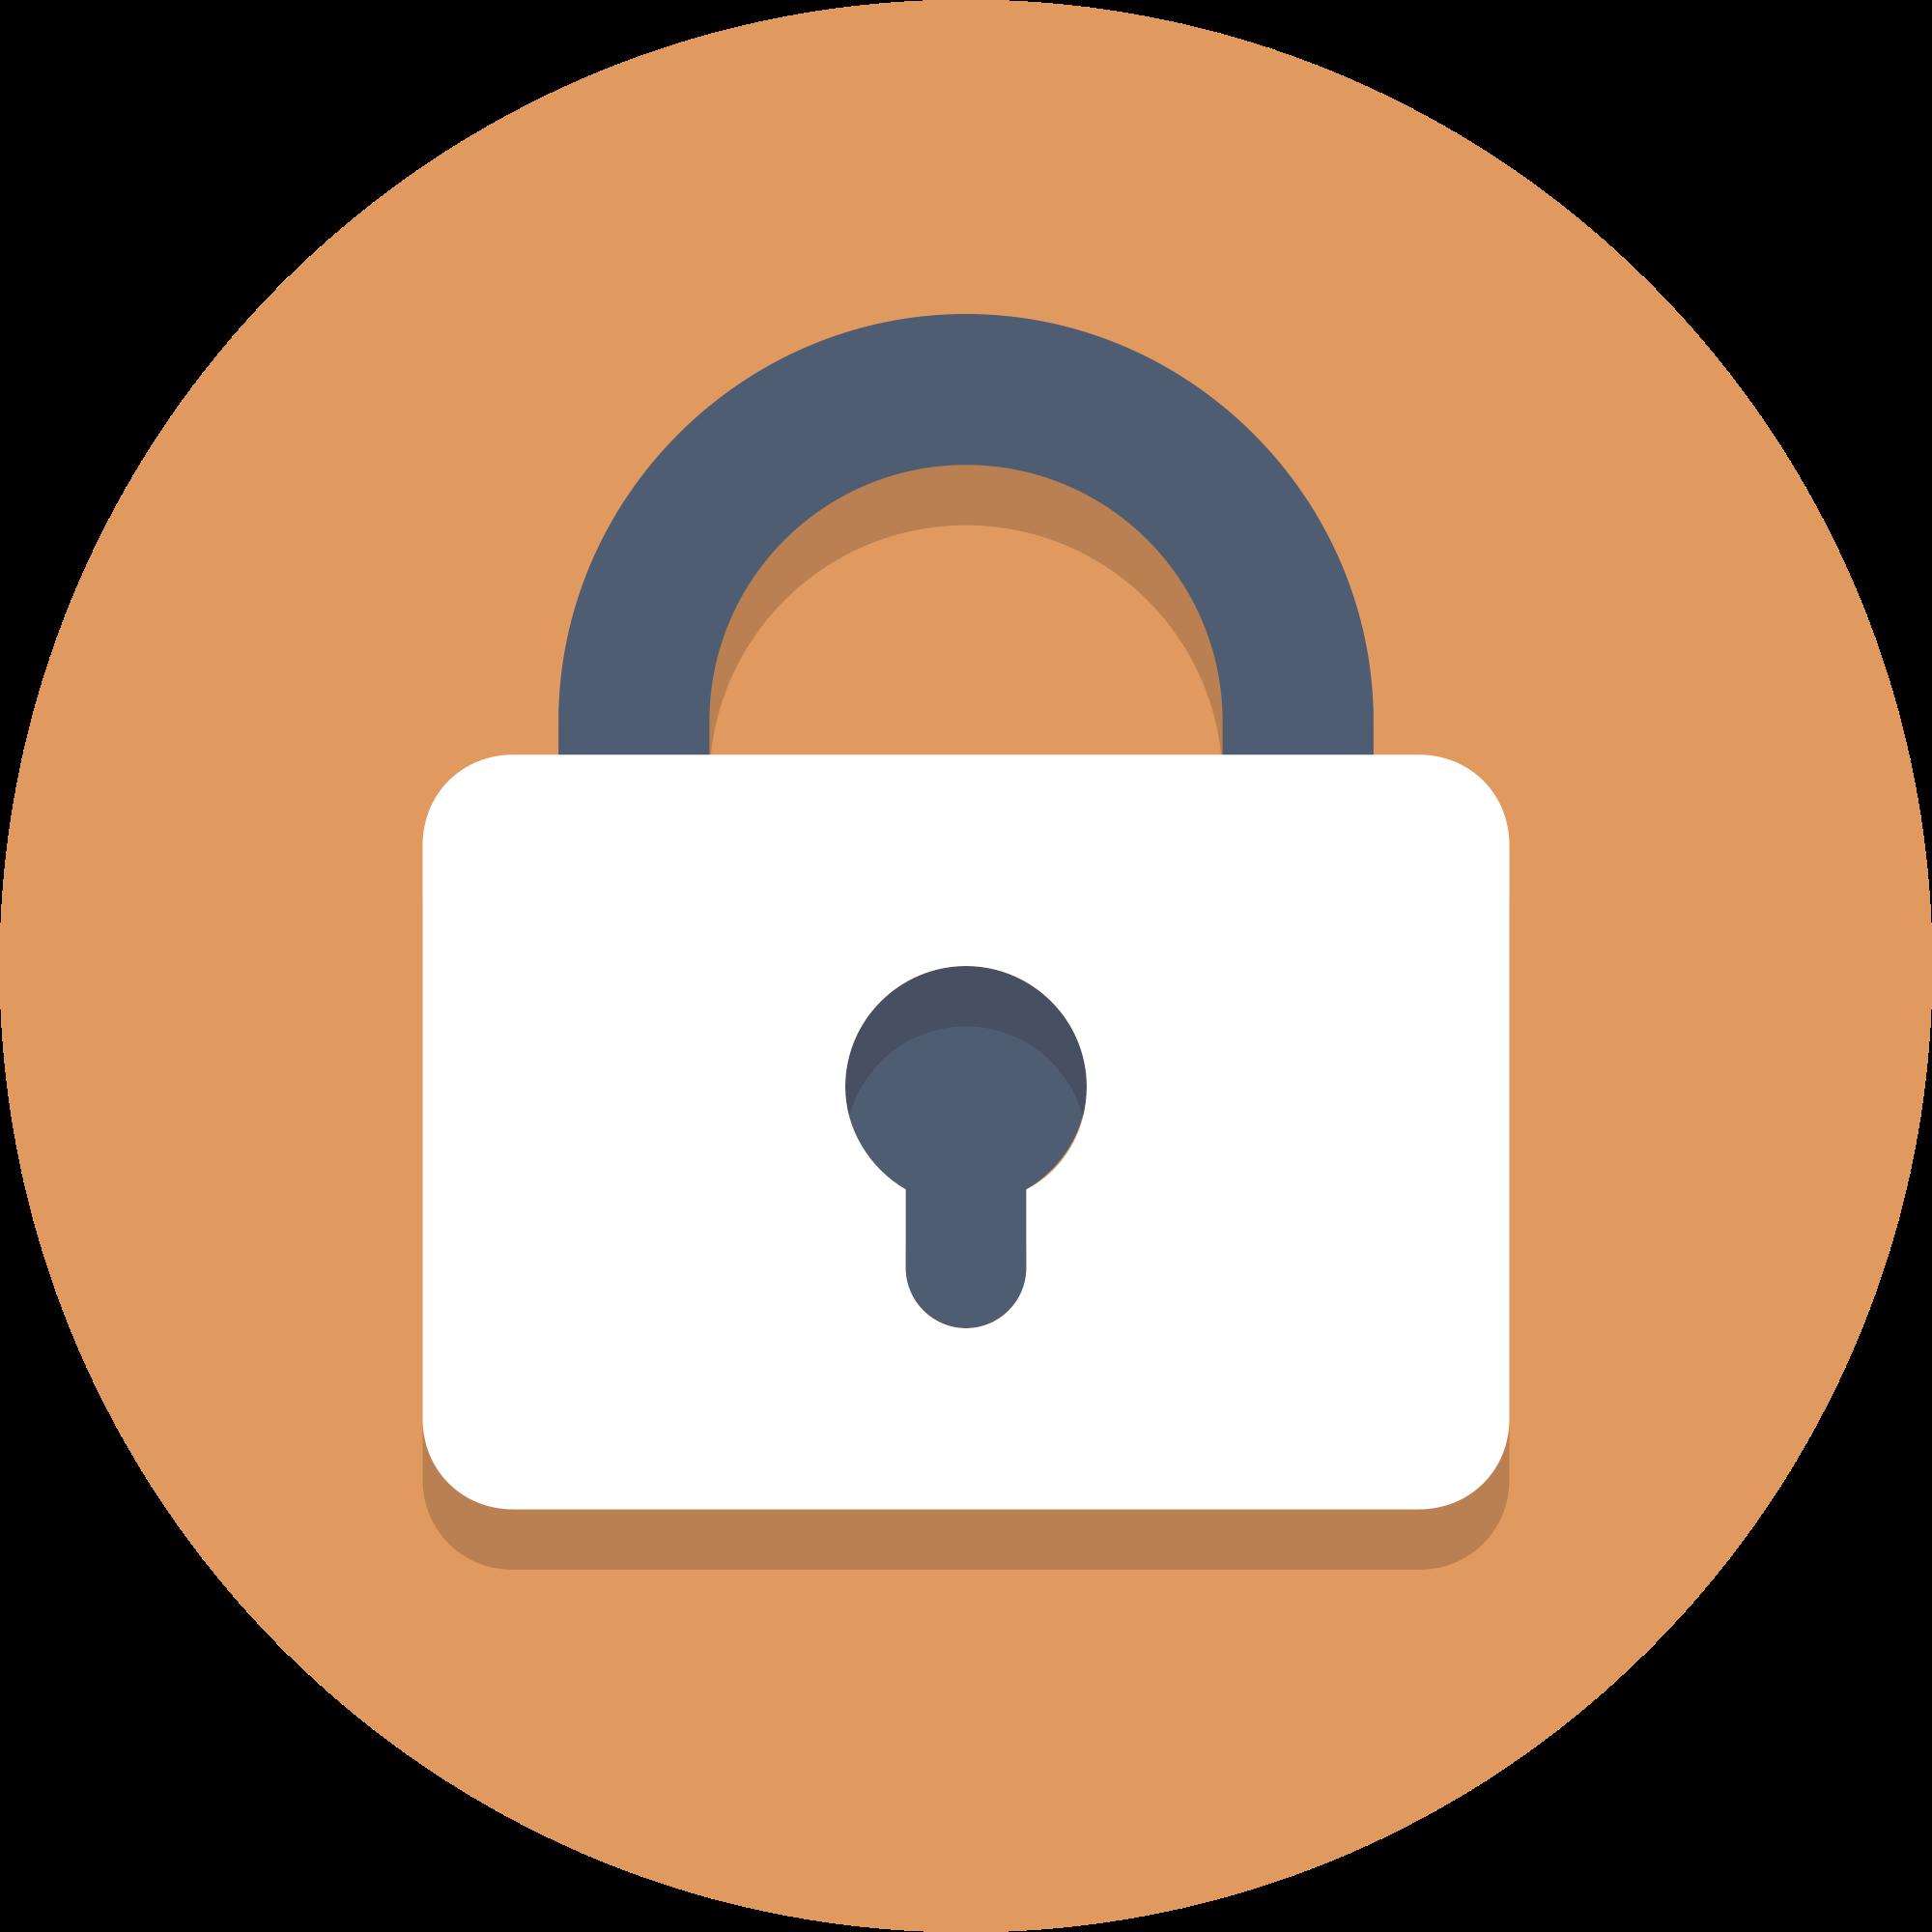 padlock clipart locked